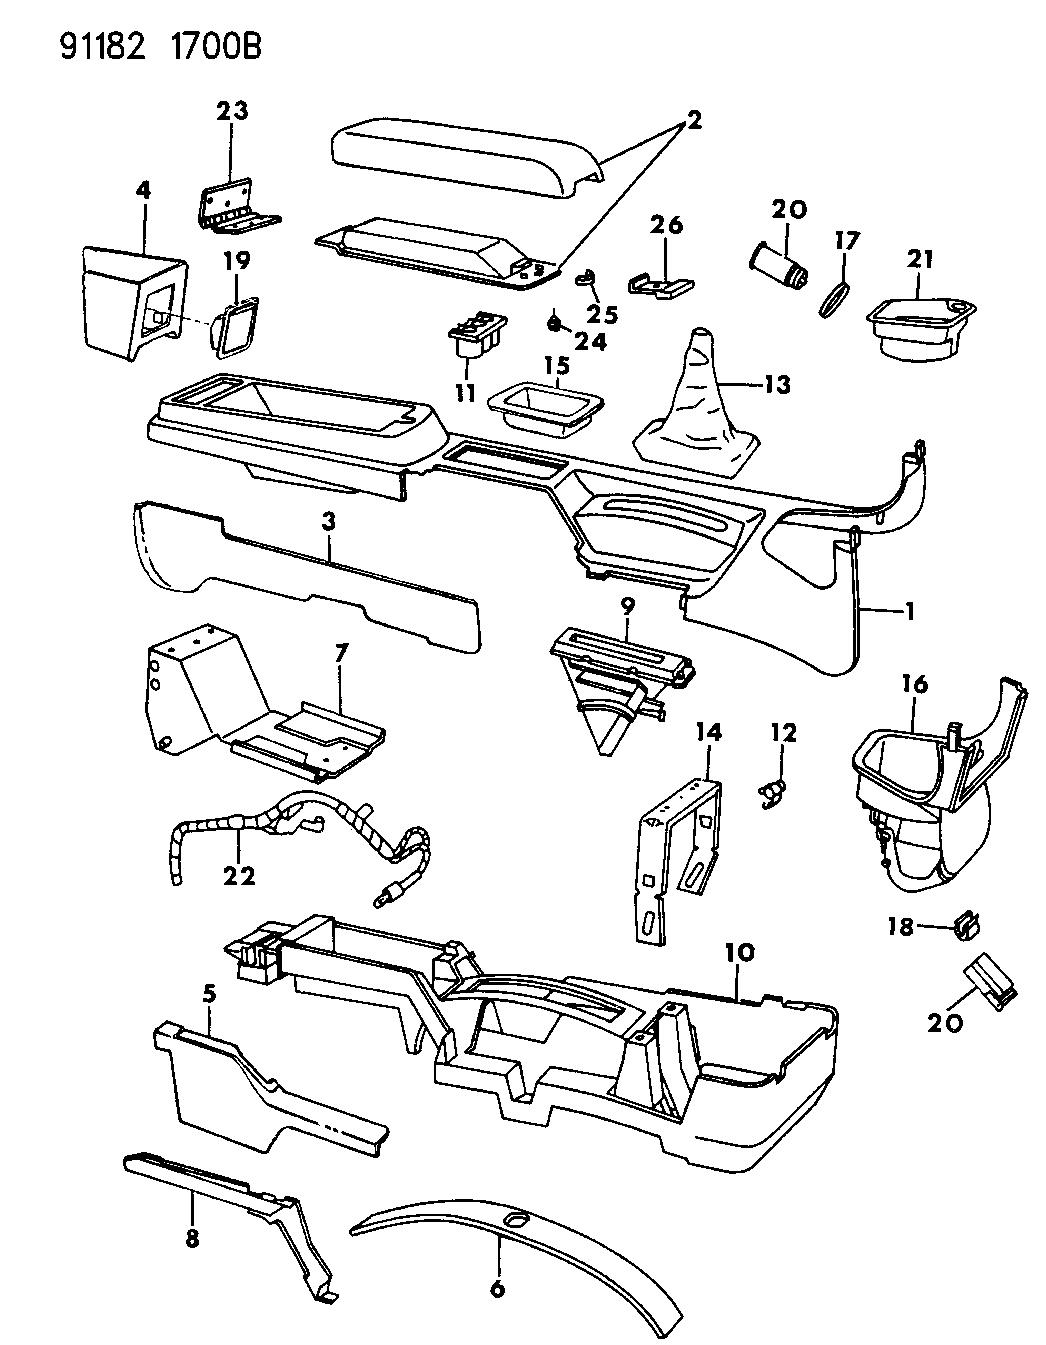 1991 Chrysler Lebaron Wiring Diagram - Wiring Diagram Schema